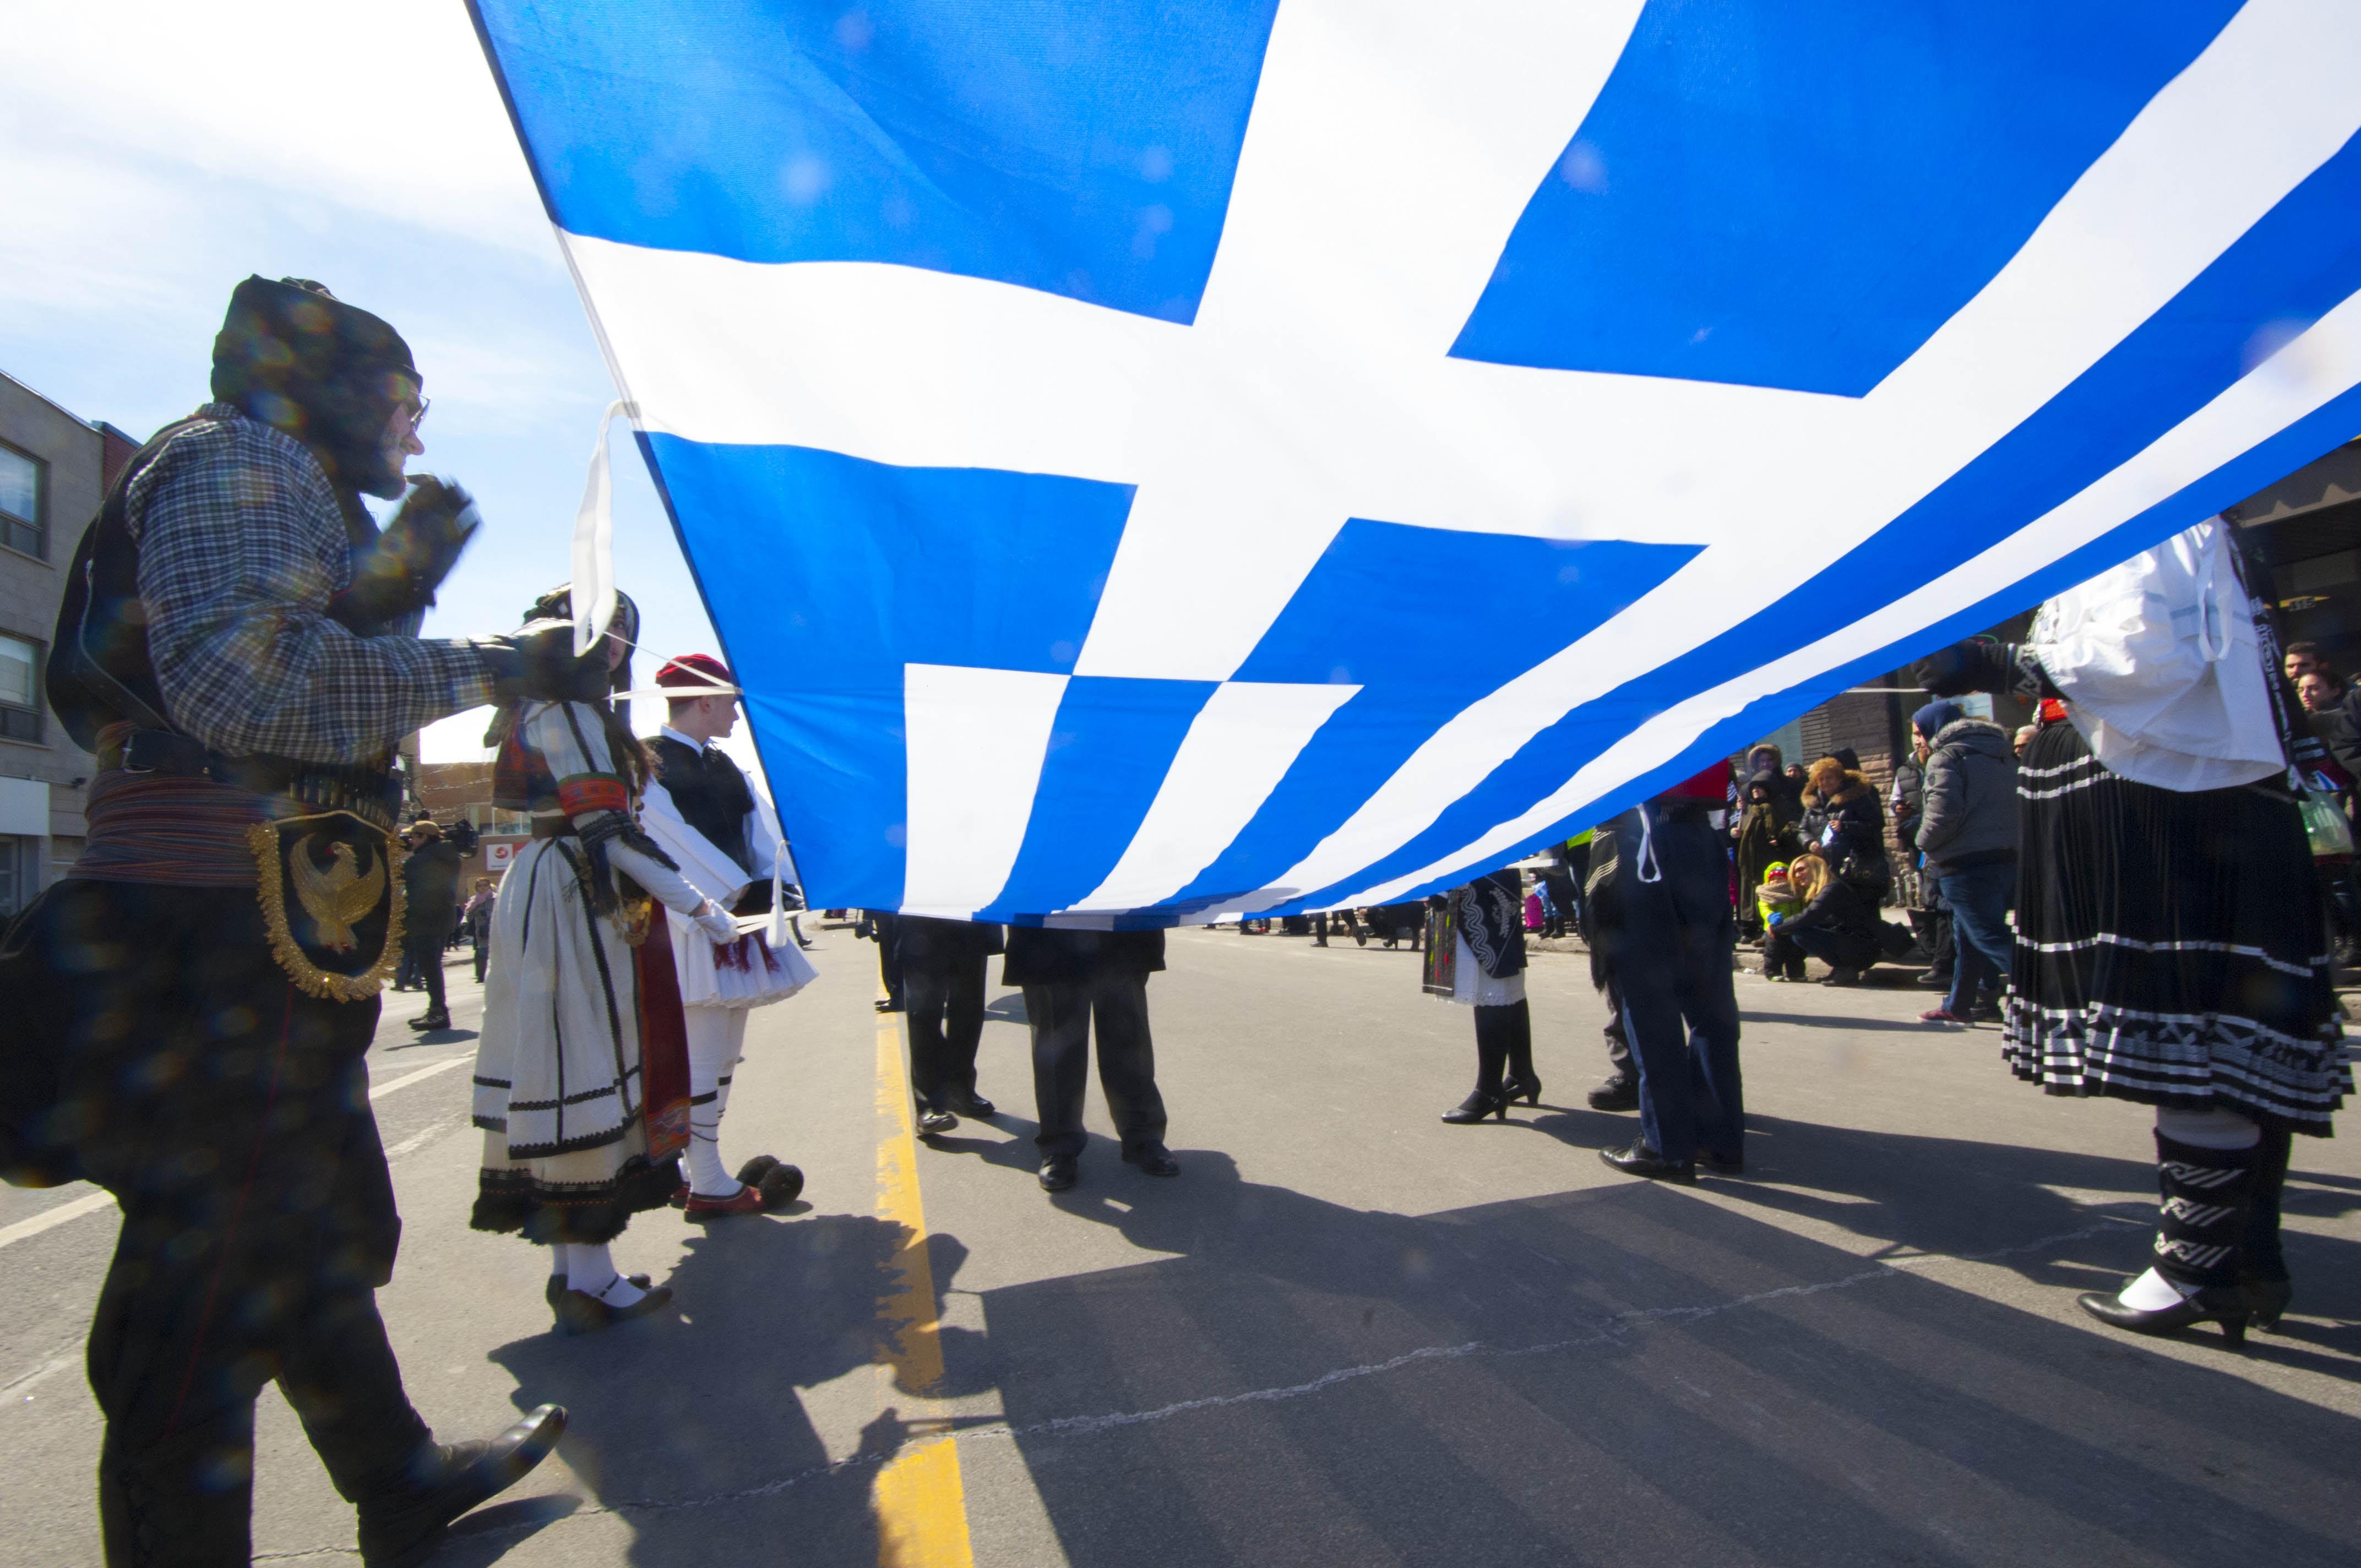 Greek National Holiday celebrations